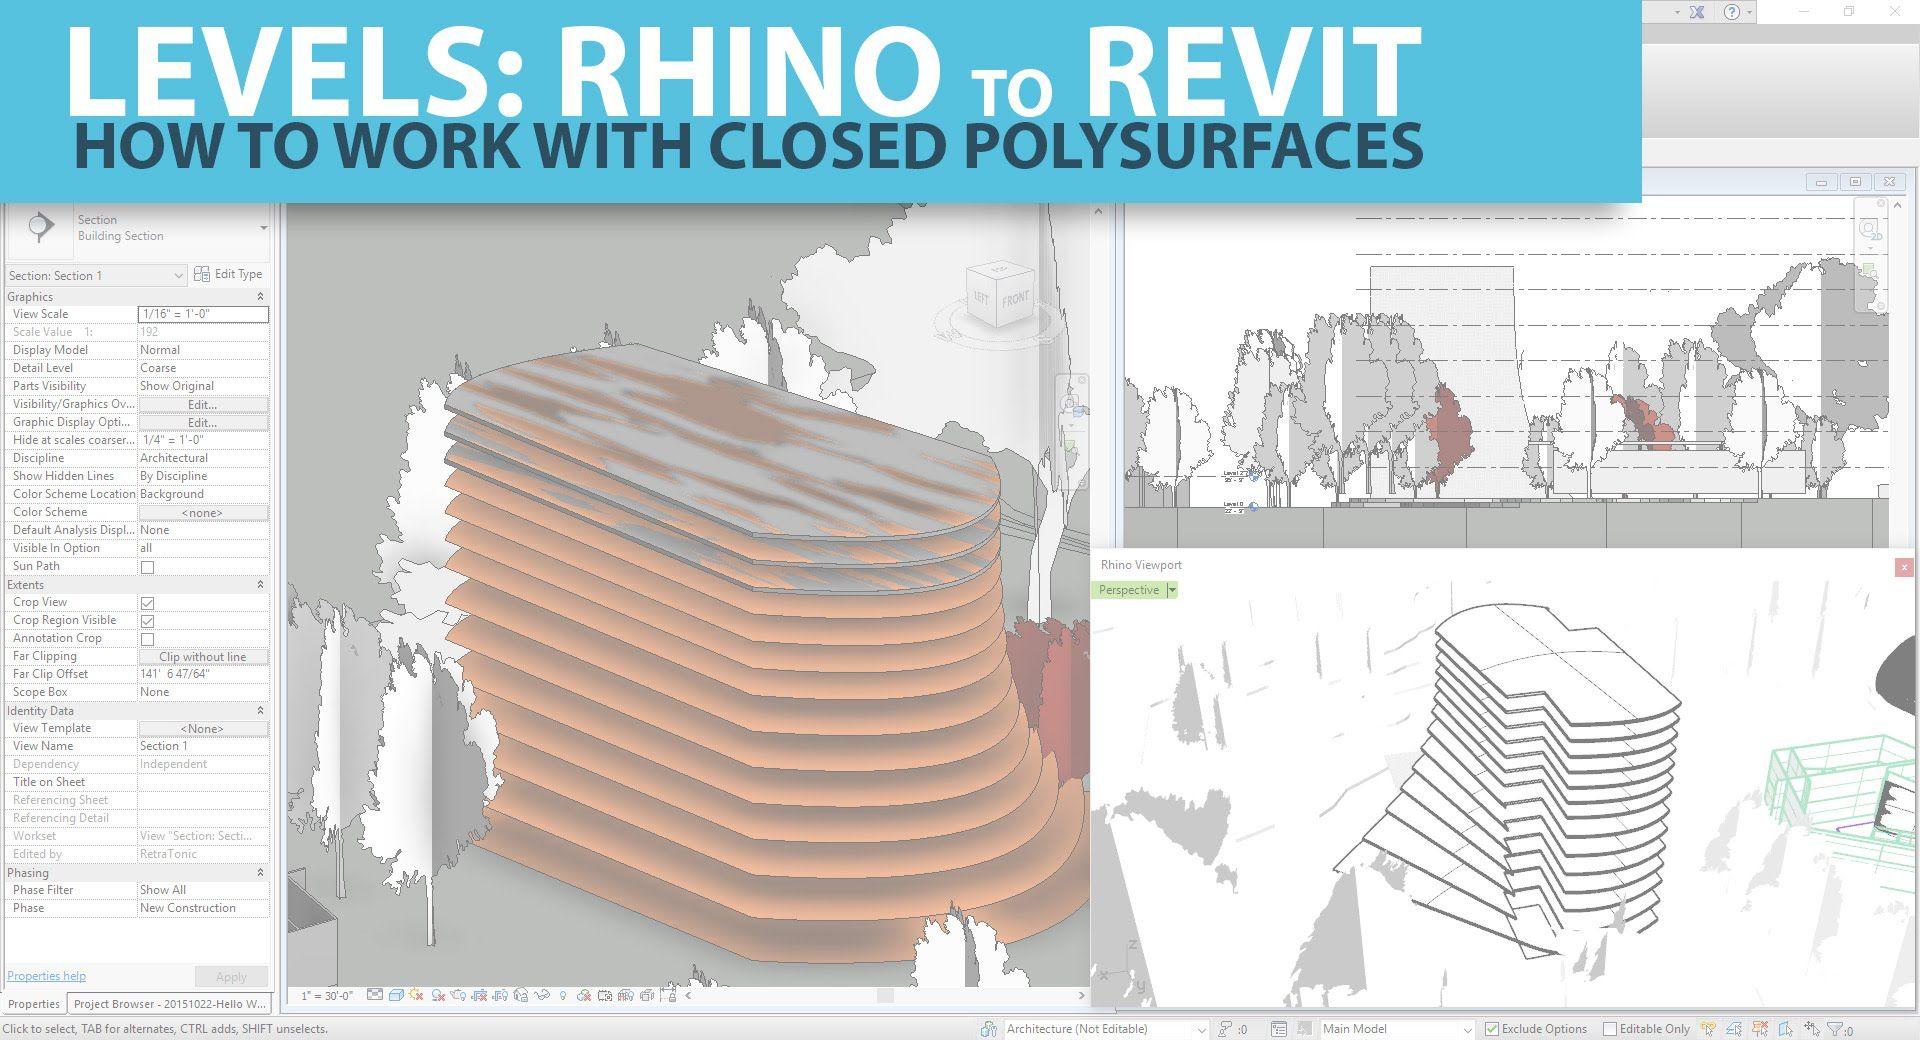 Interoperability Guide: Rhino Levels to Revit 1